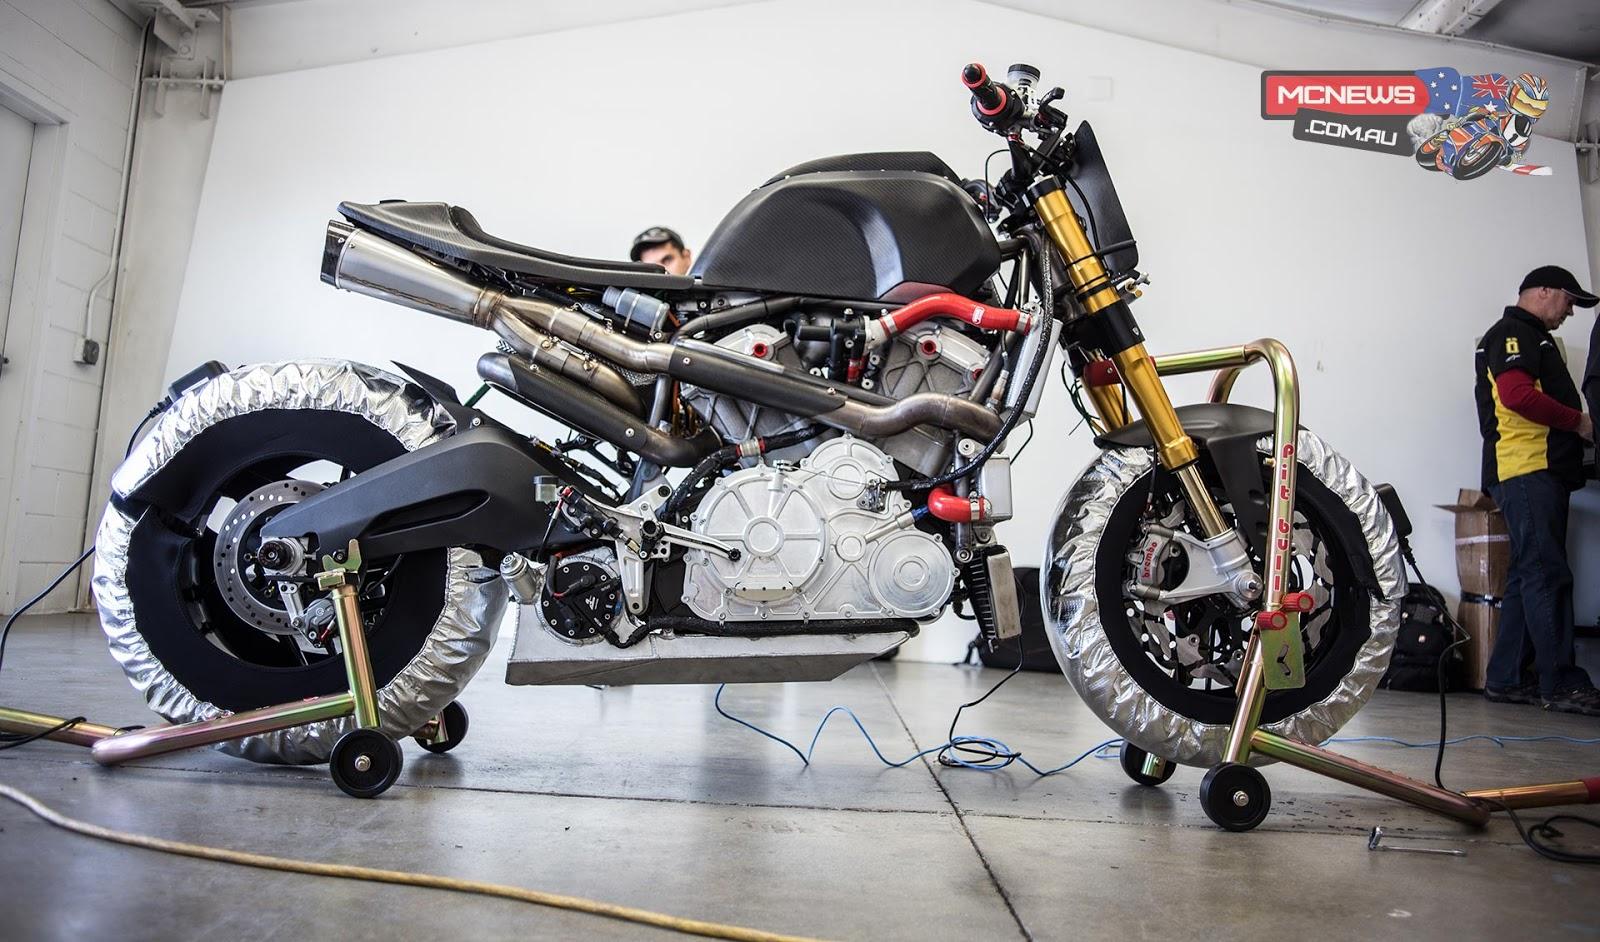 blog of the biker indian scout race motor for victory. Black Bedroom Furniture Sets. Home Design Ideas